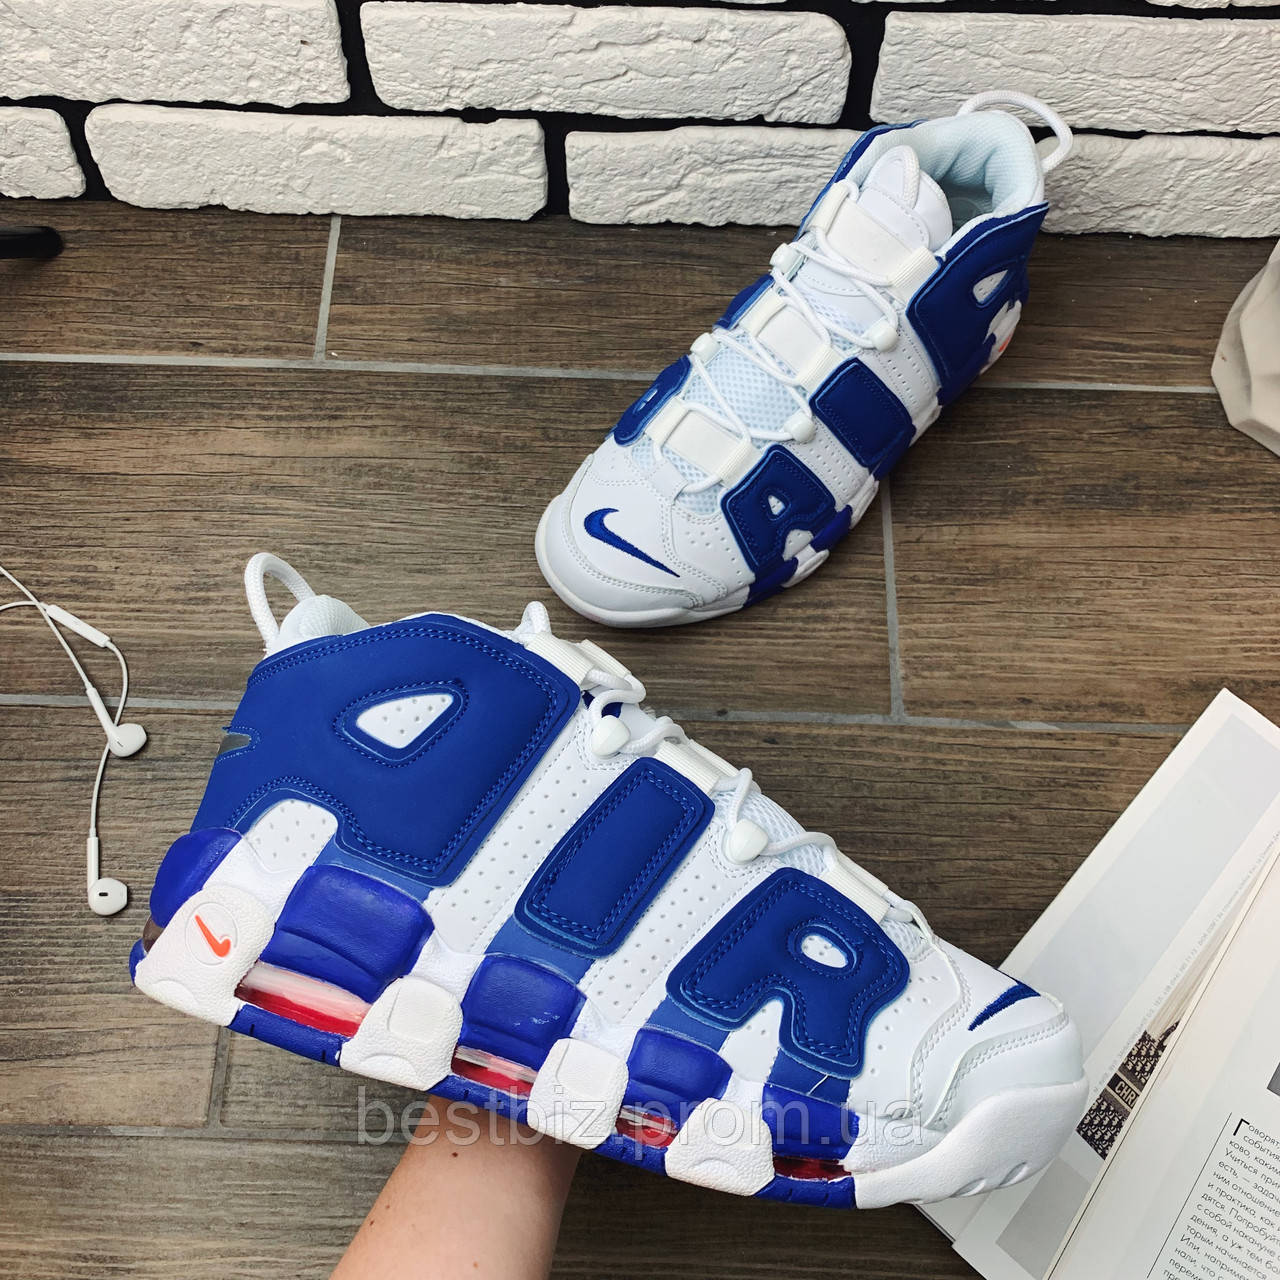 Nike More Uptempo 1169 ⏩ [ 44 останній розмір ]